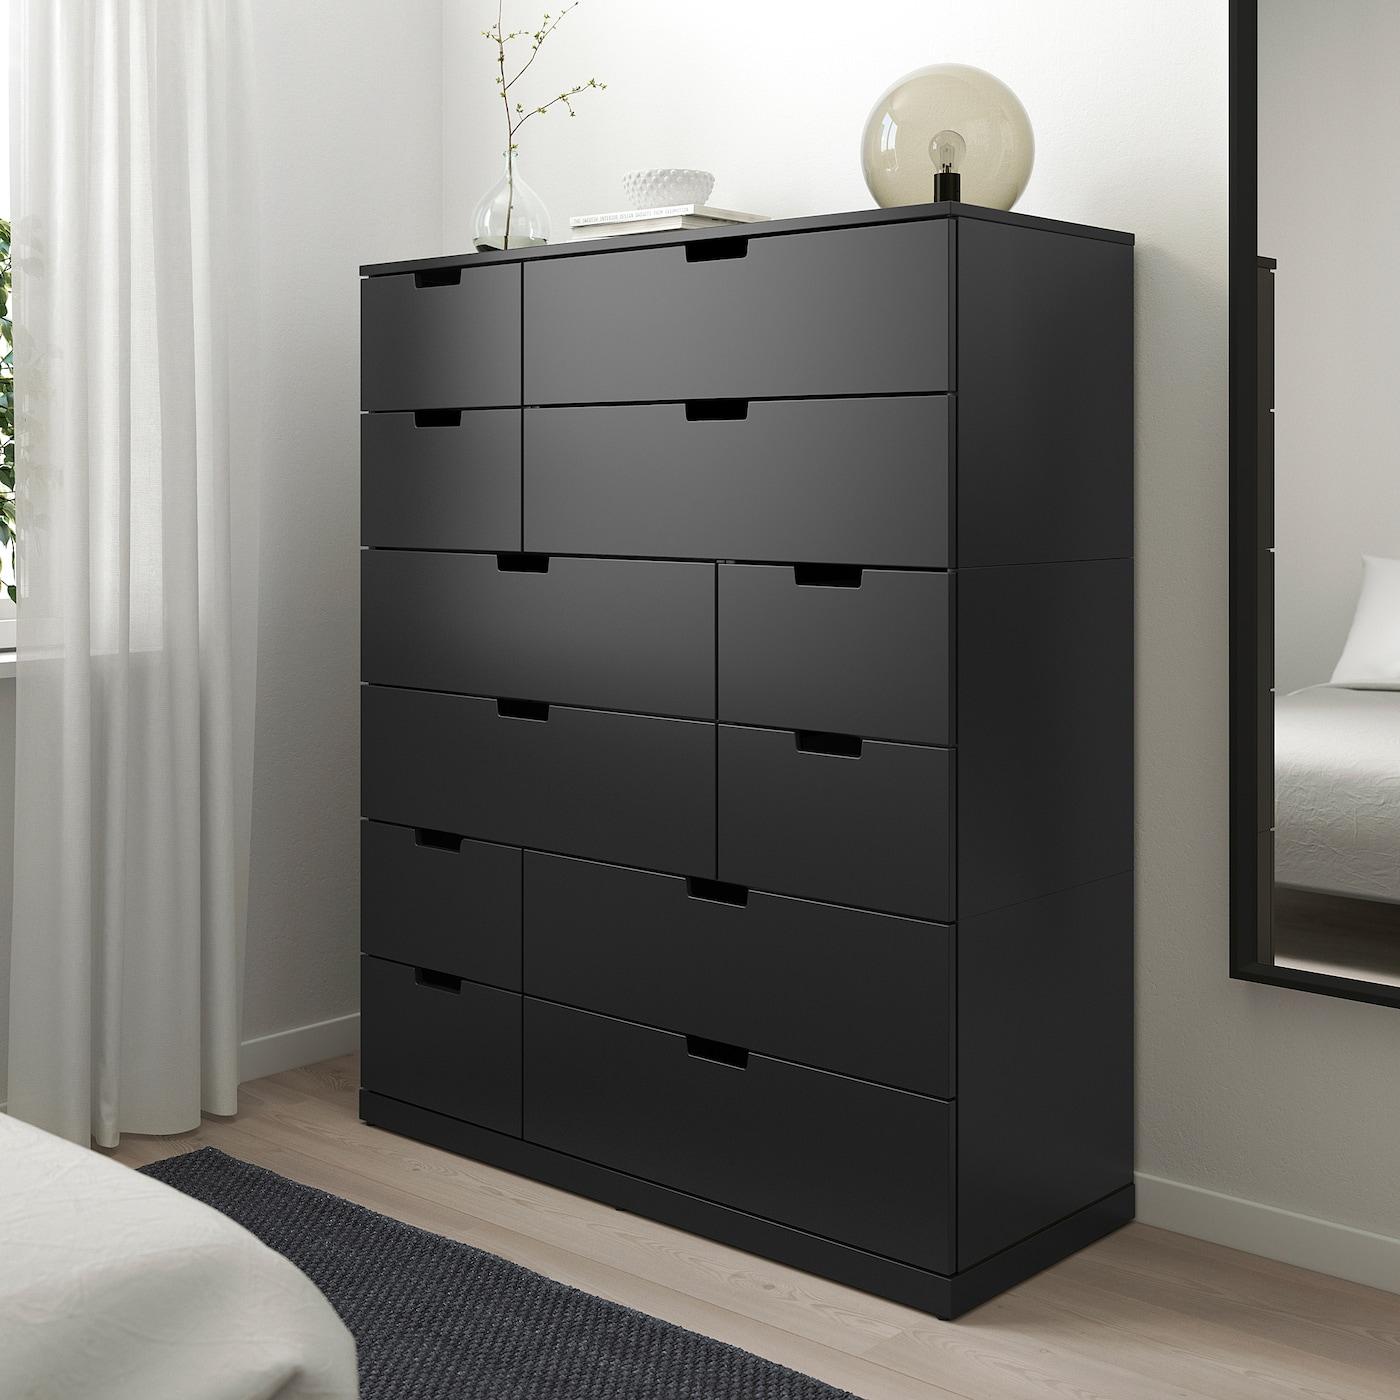 NORDLI Chest of 12 drawers anthracite 120x145 cm